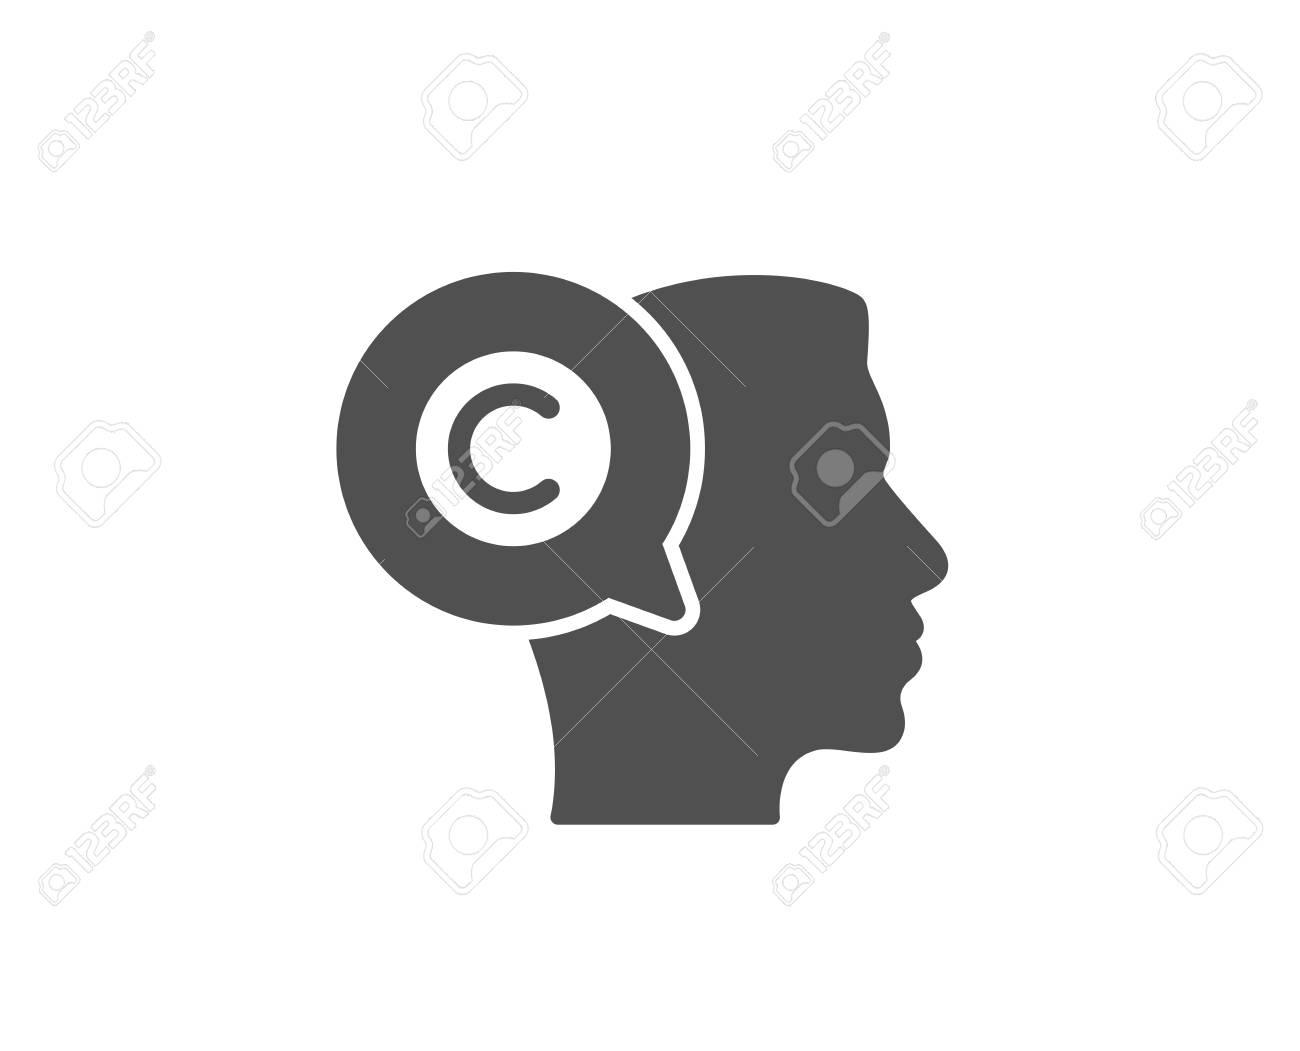 Elements of copywriting